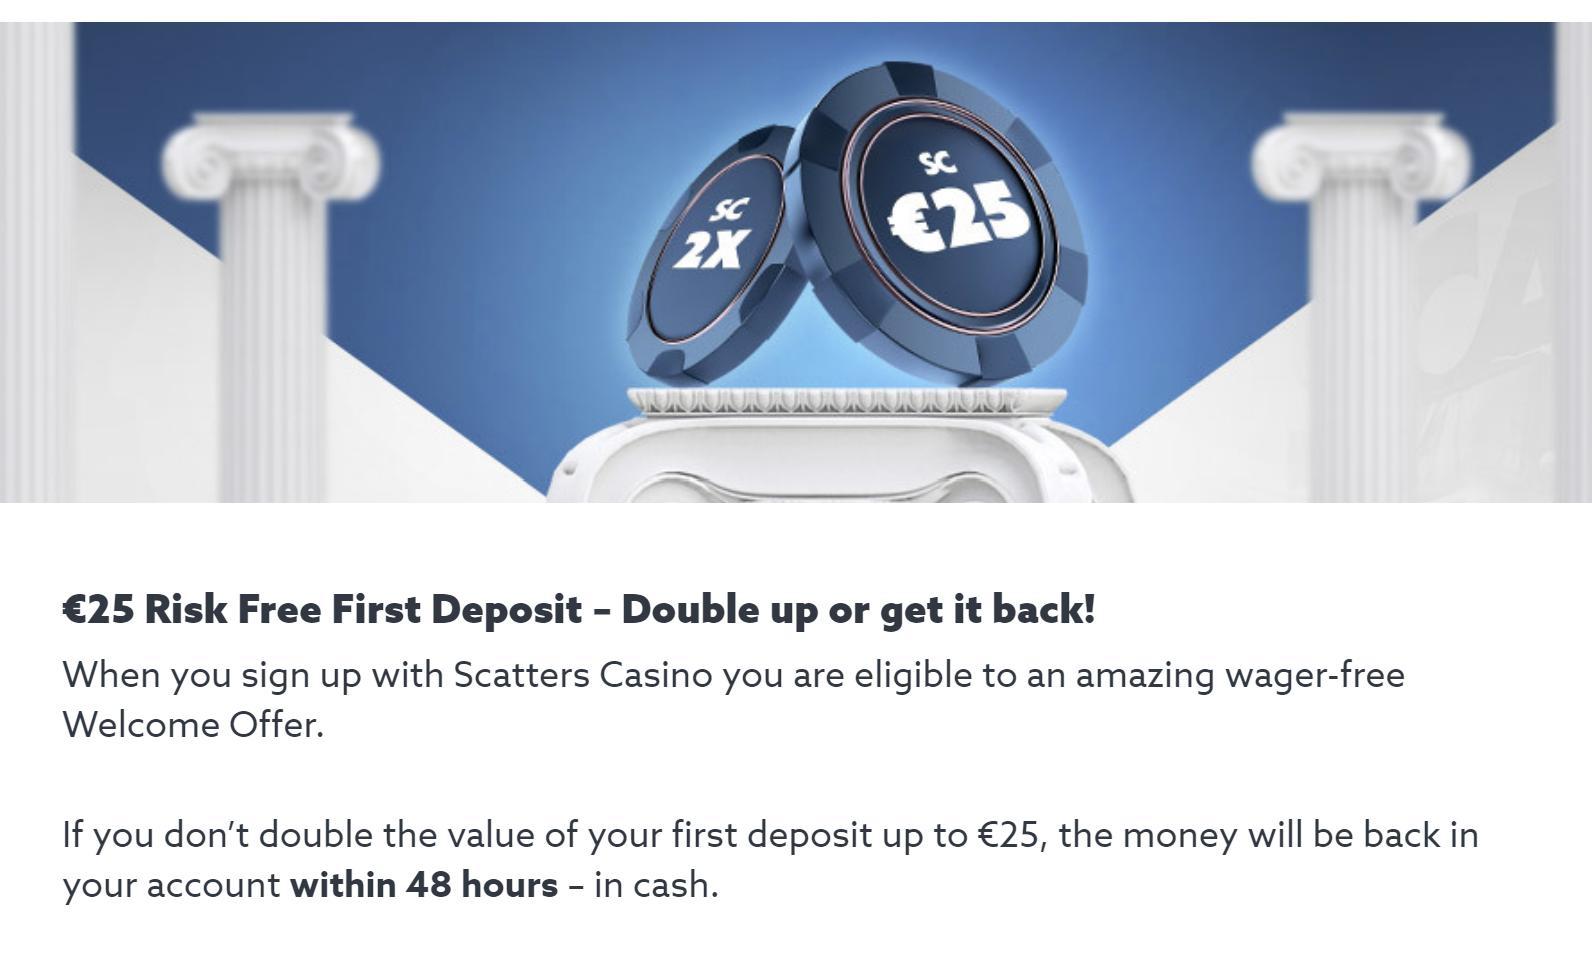 25€ kazino įmoka be rizikos no risk first deposit